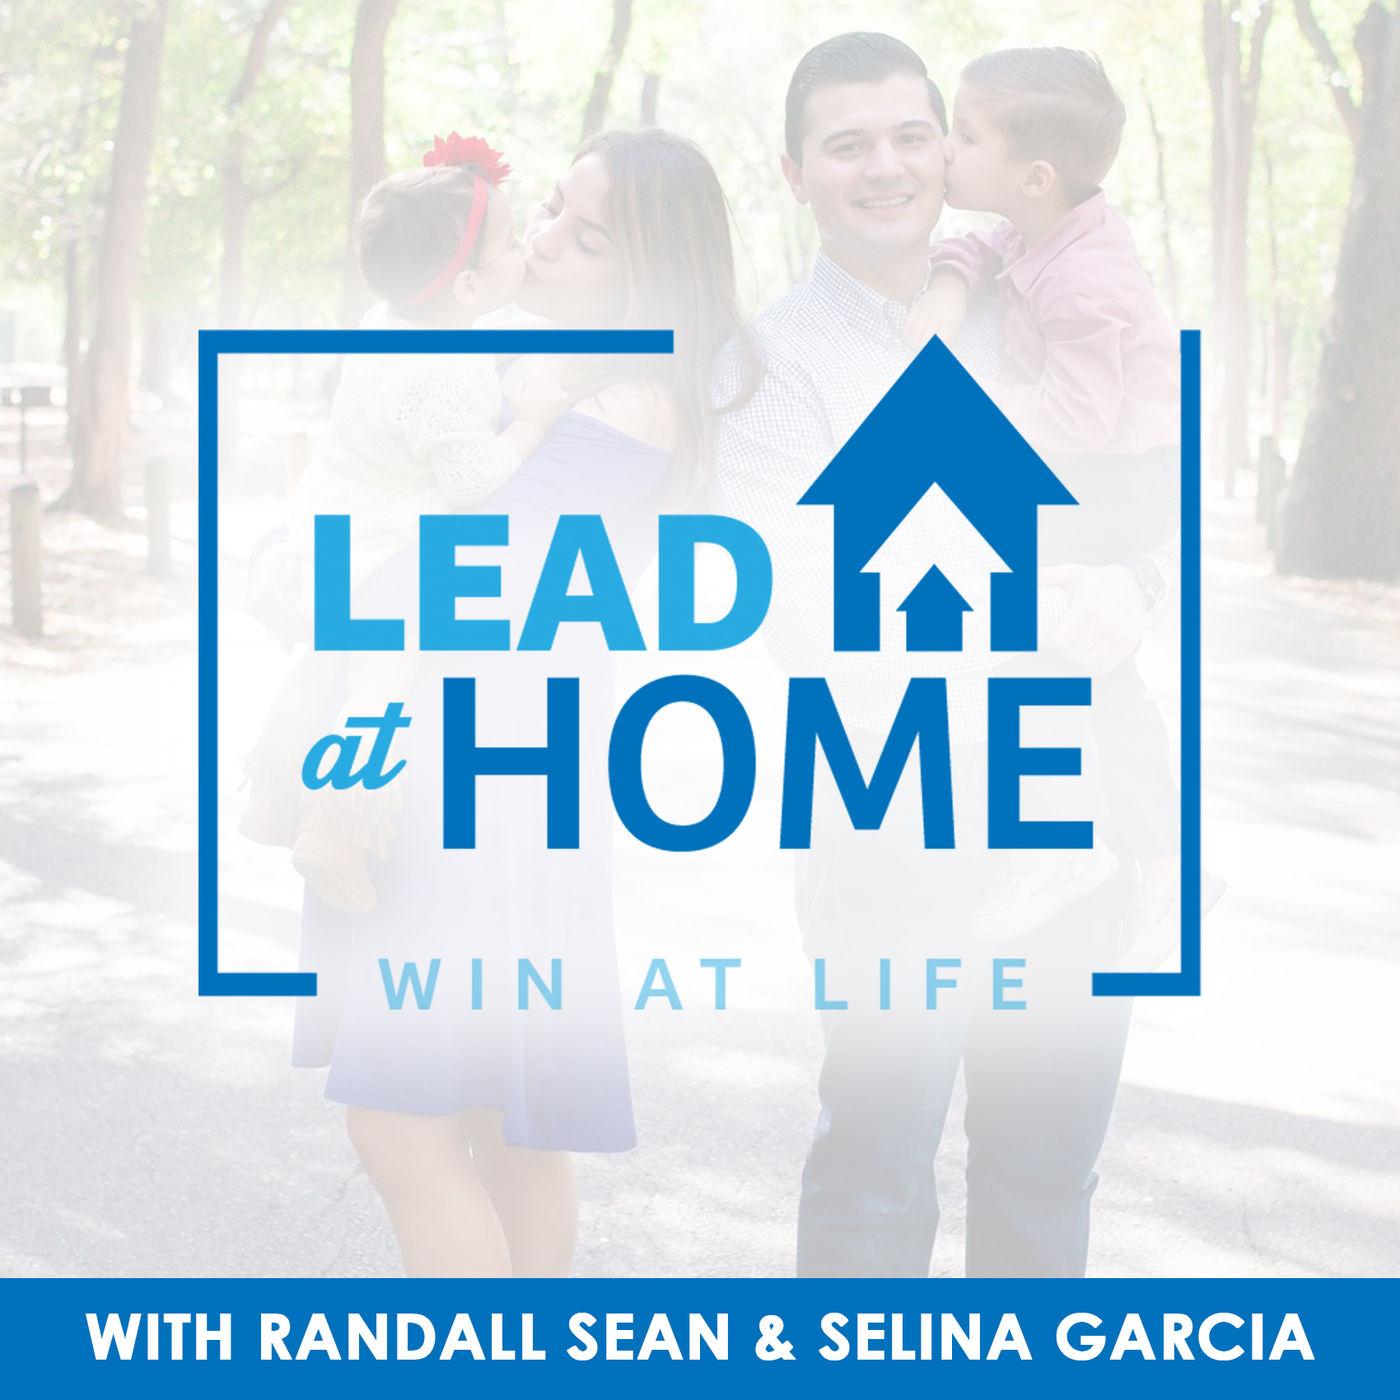 Lead At Home (Win At Life)